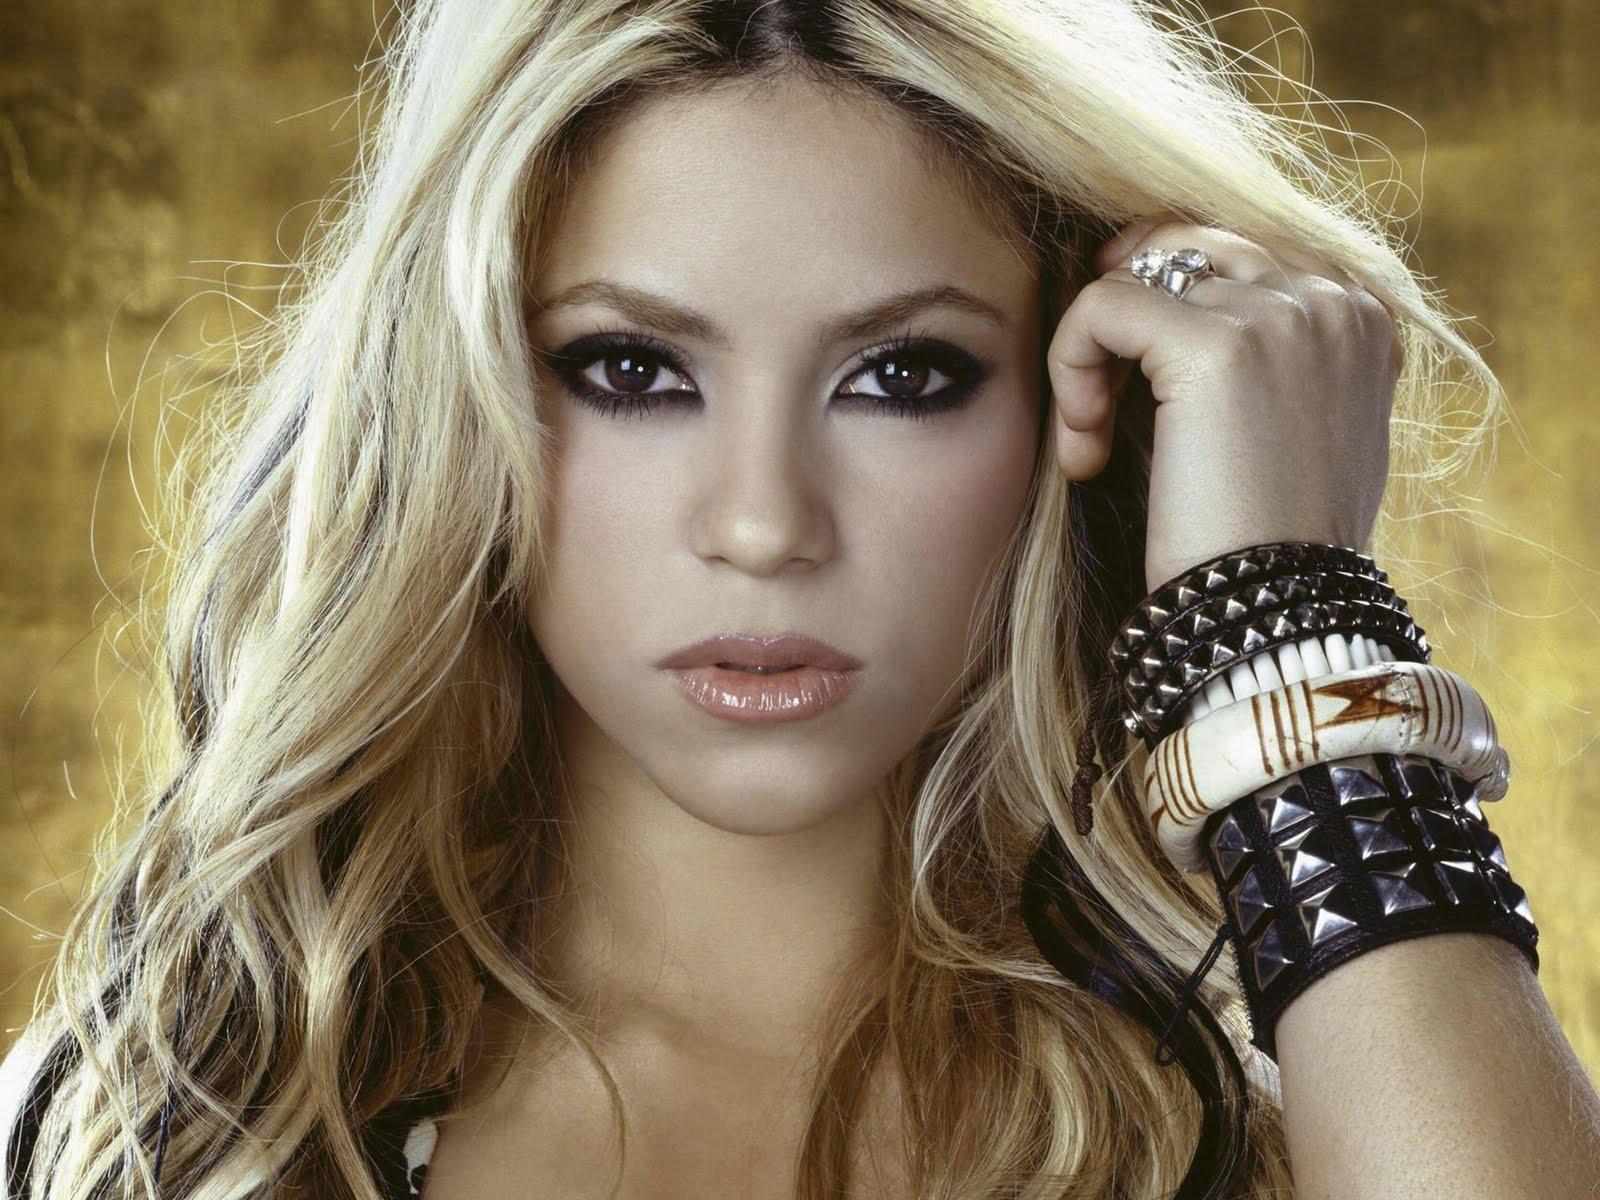 http://3.bp.blogspot.com/-4ArY_bvlA2M/Ttz7_lG2eII/AAAAAAAACYI/g0N_gJb3PkE/s1600/Shakira_HQ_wallpapers_01.jpg